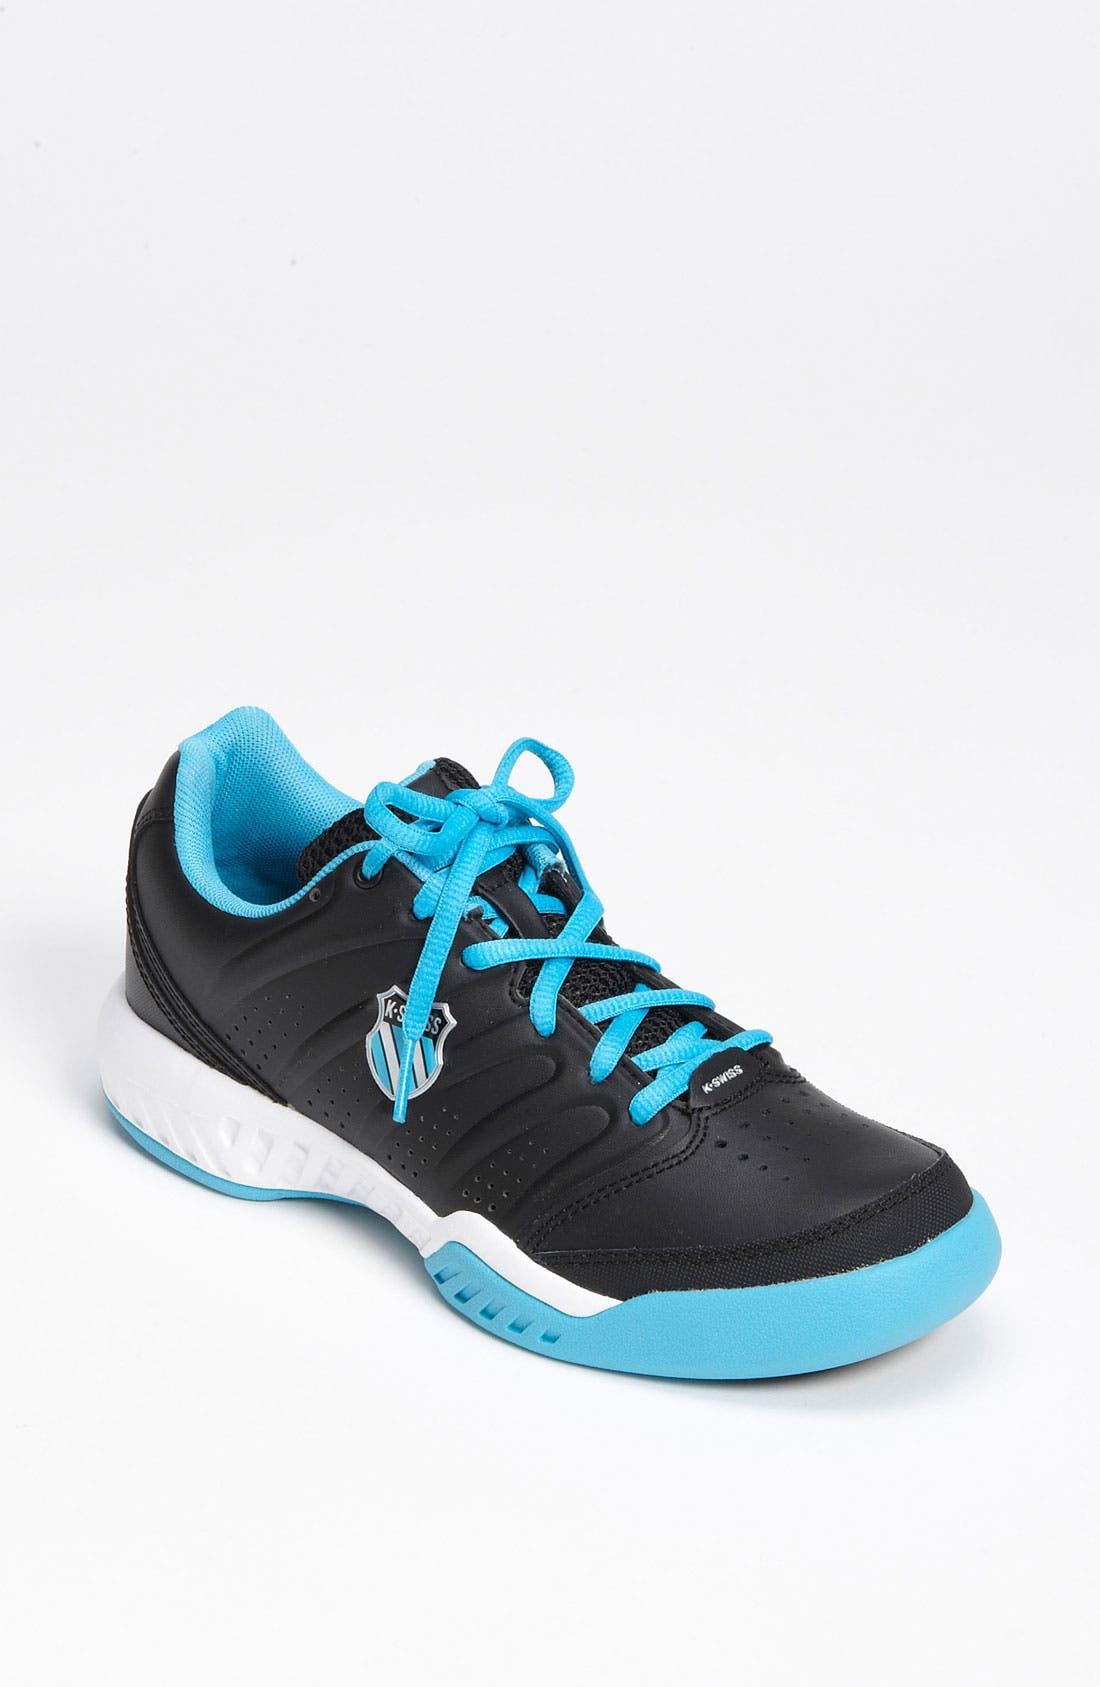 Main Image - K-Swiss 'Ultrascendor 11' Tennis Shoe (Women)